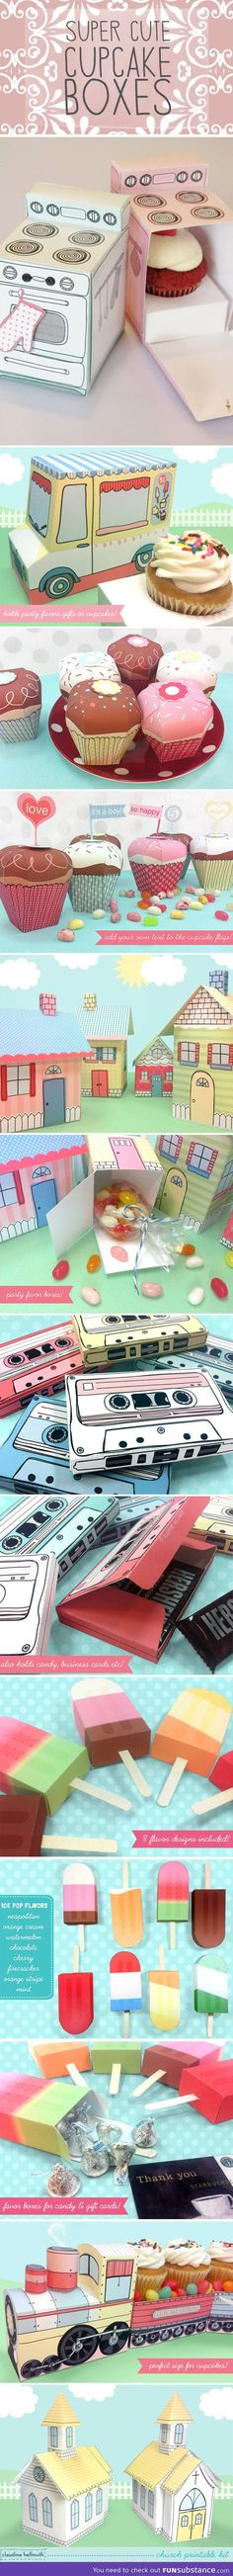 Cute and creative cupcake boxes